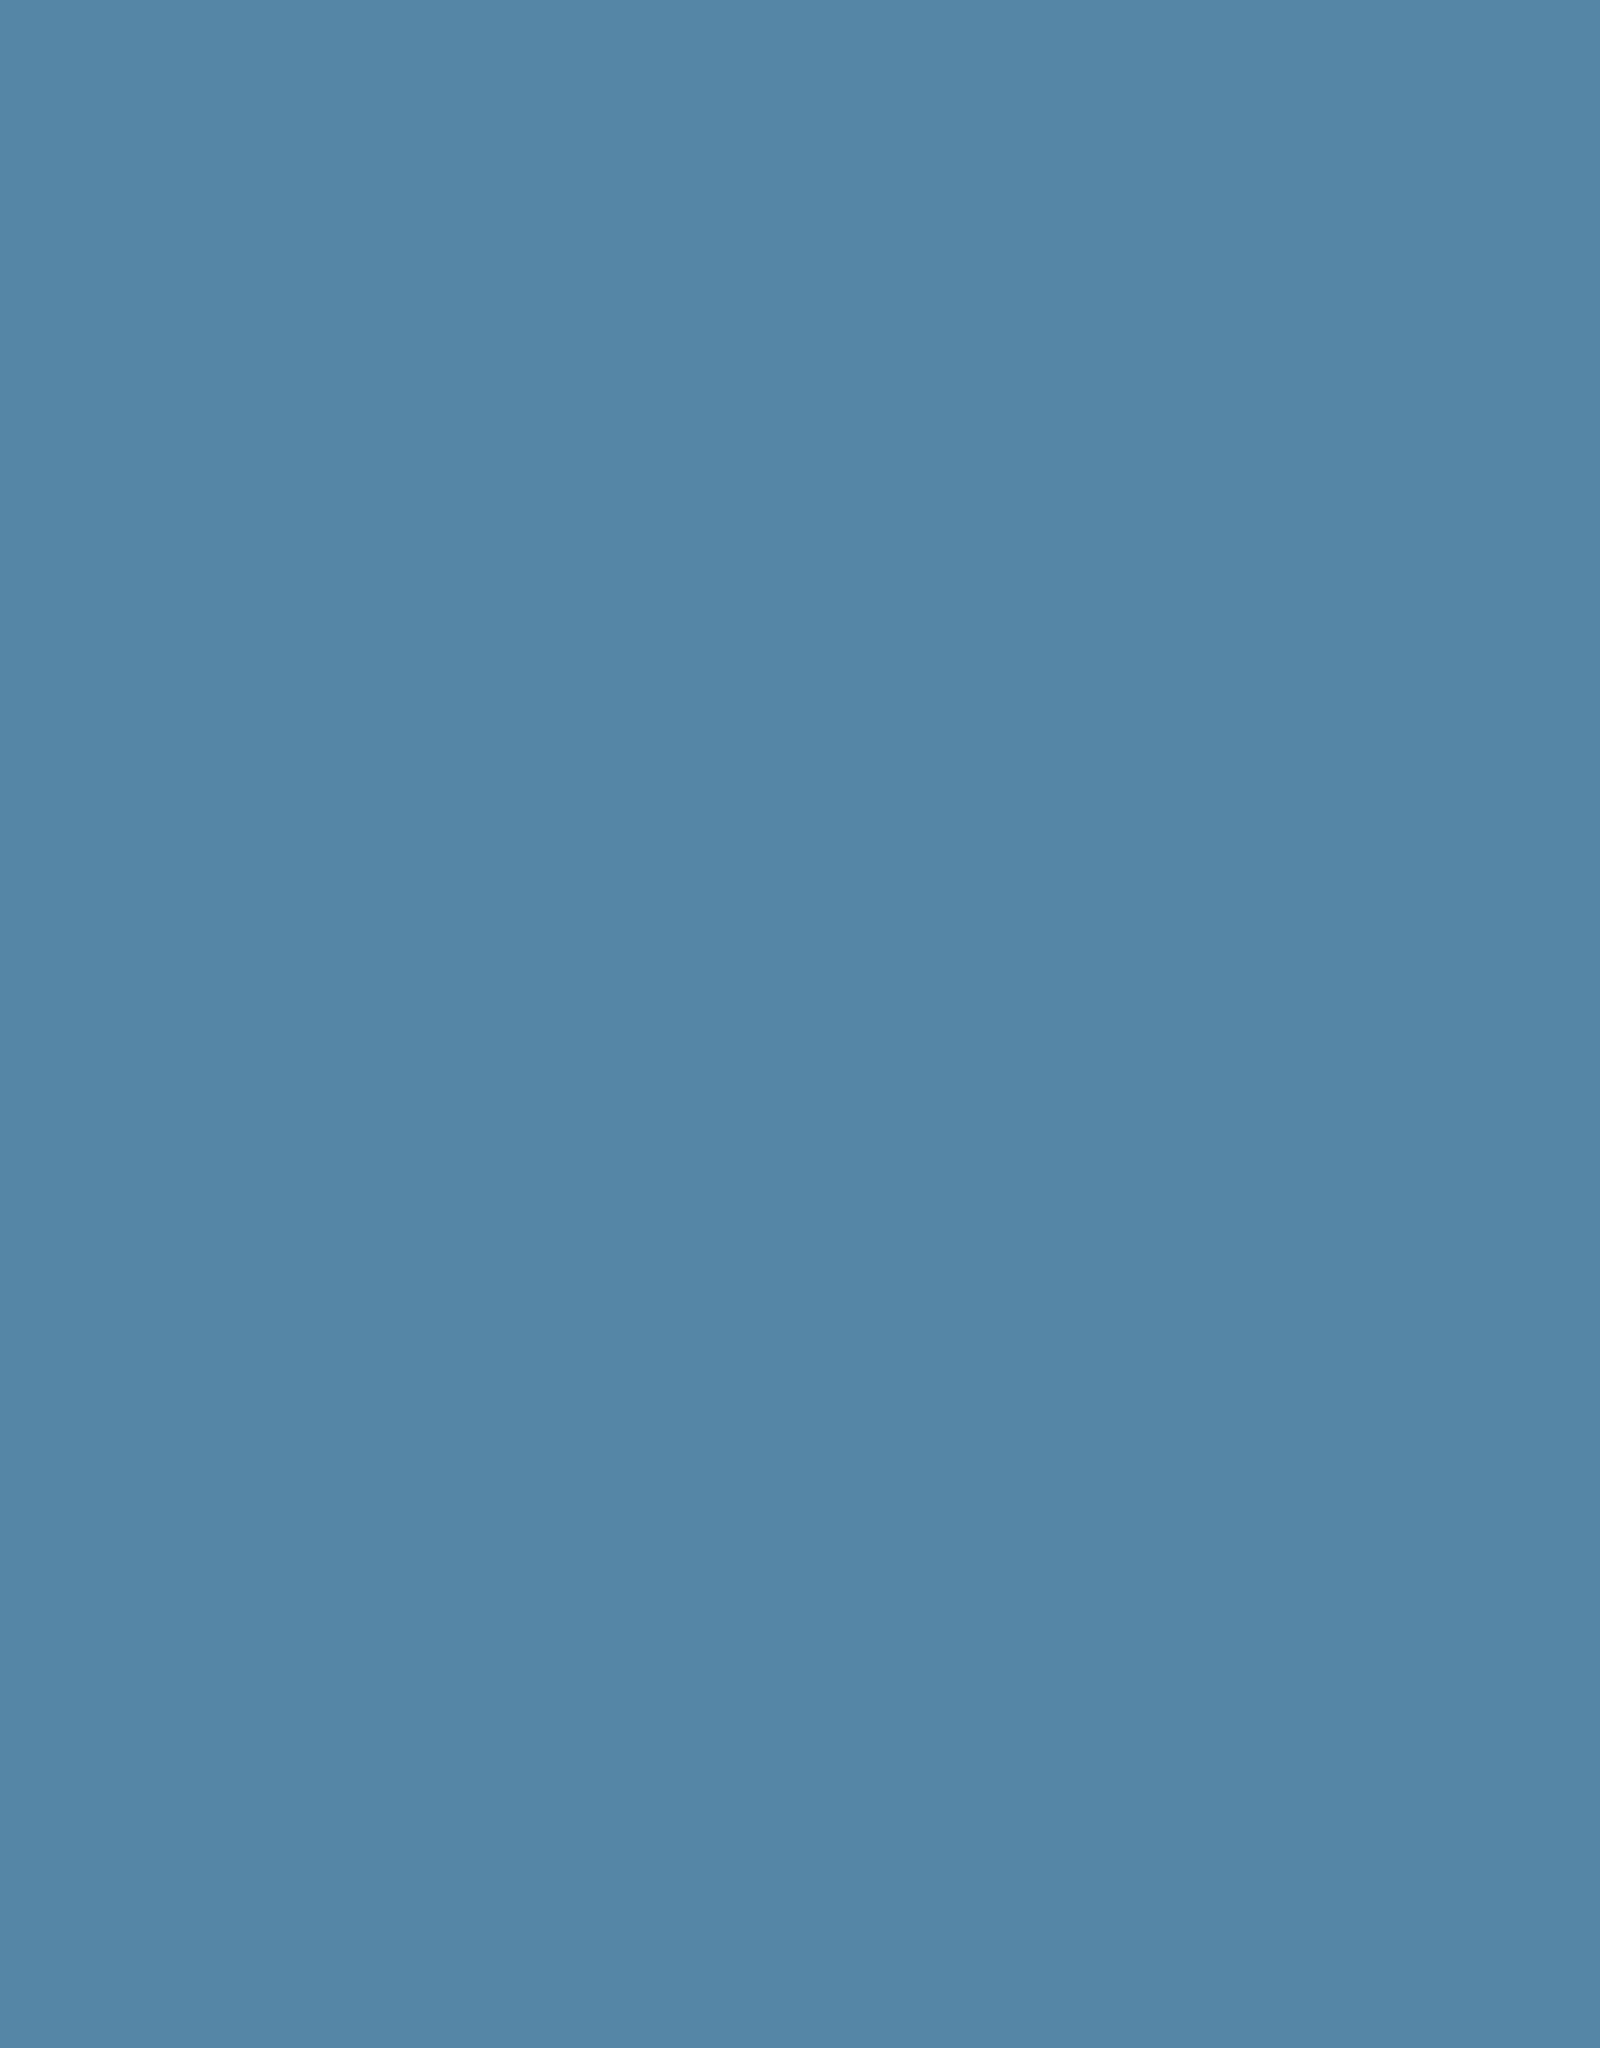 Superior Seamless Superior Seamless Marine Blue #41